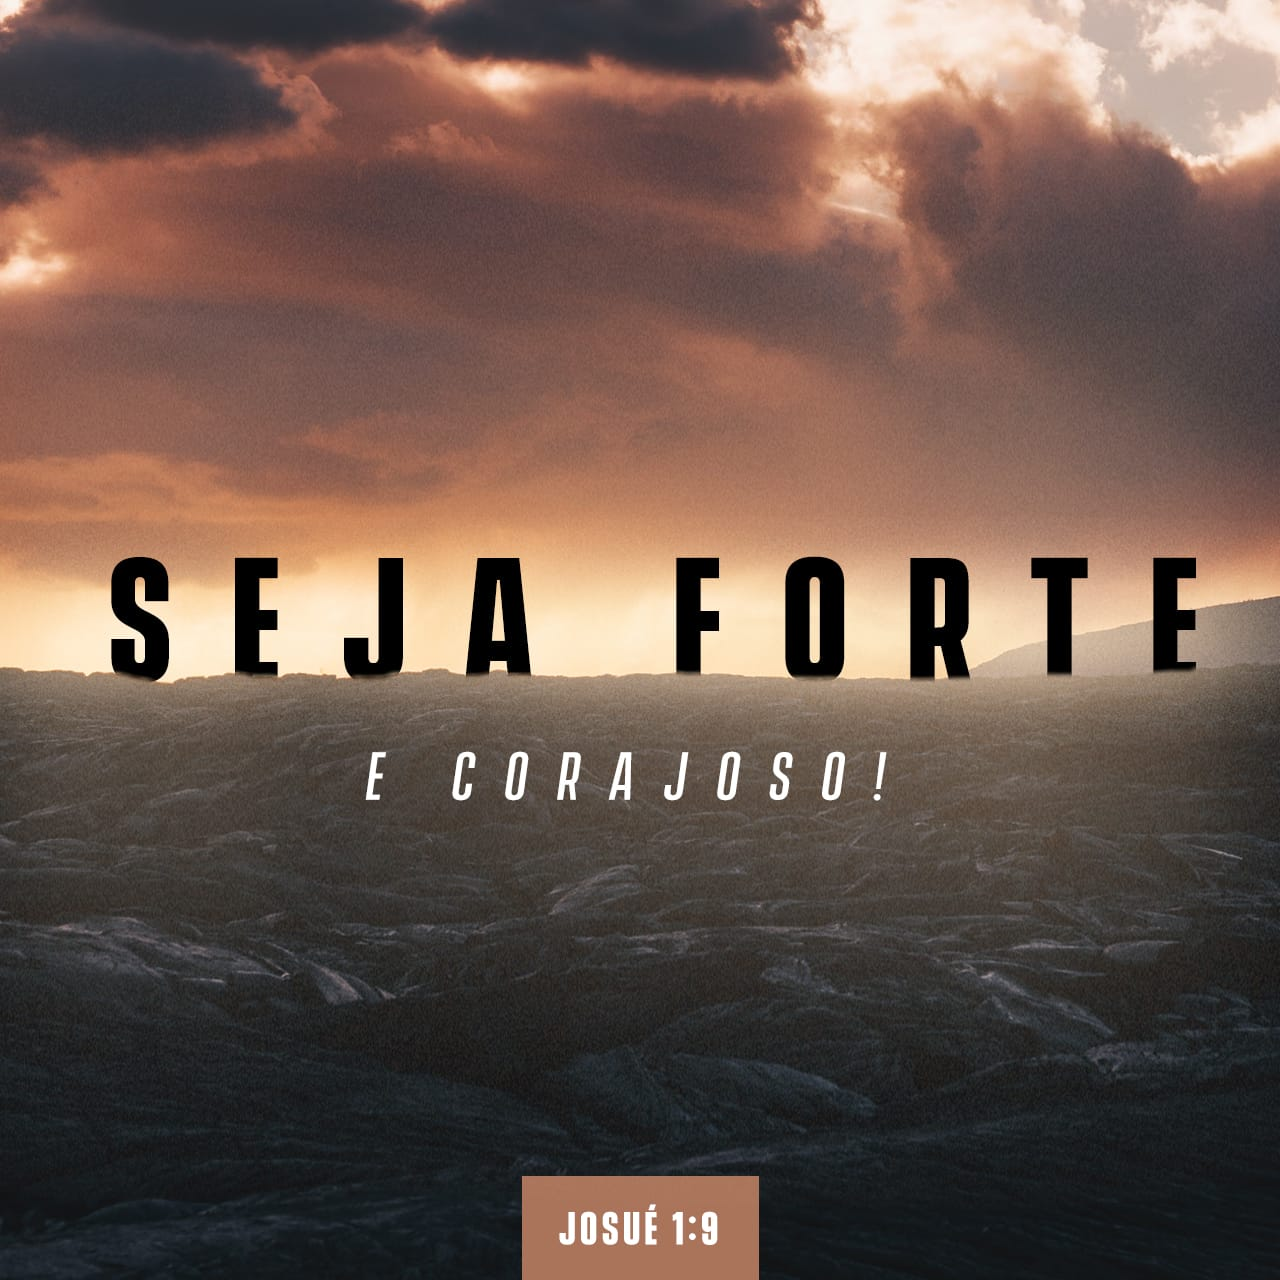 Seja Forte e corajoso! Josue 1 : 9